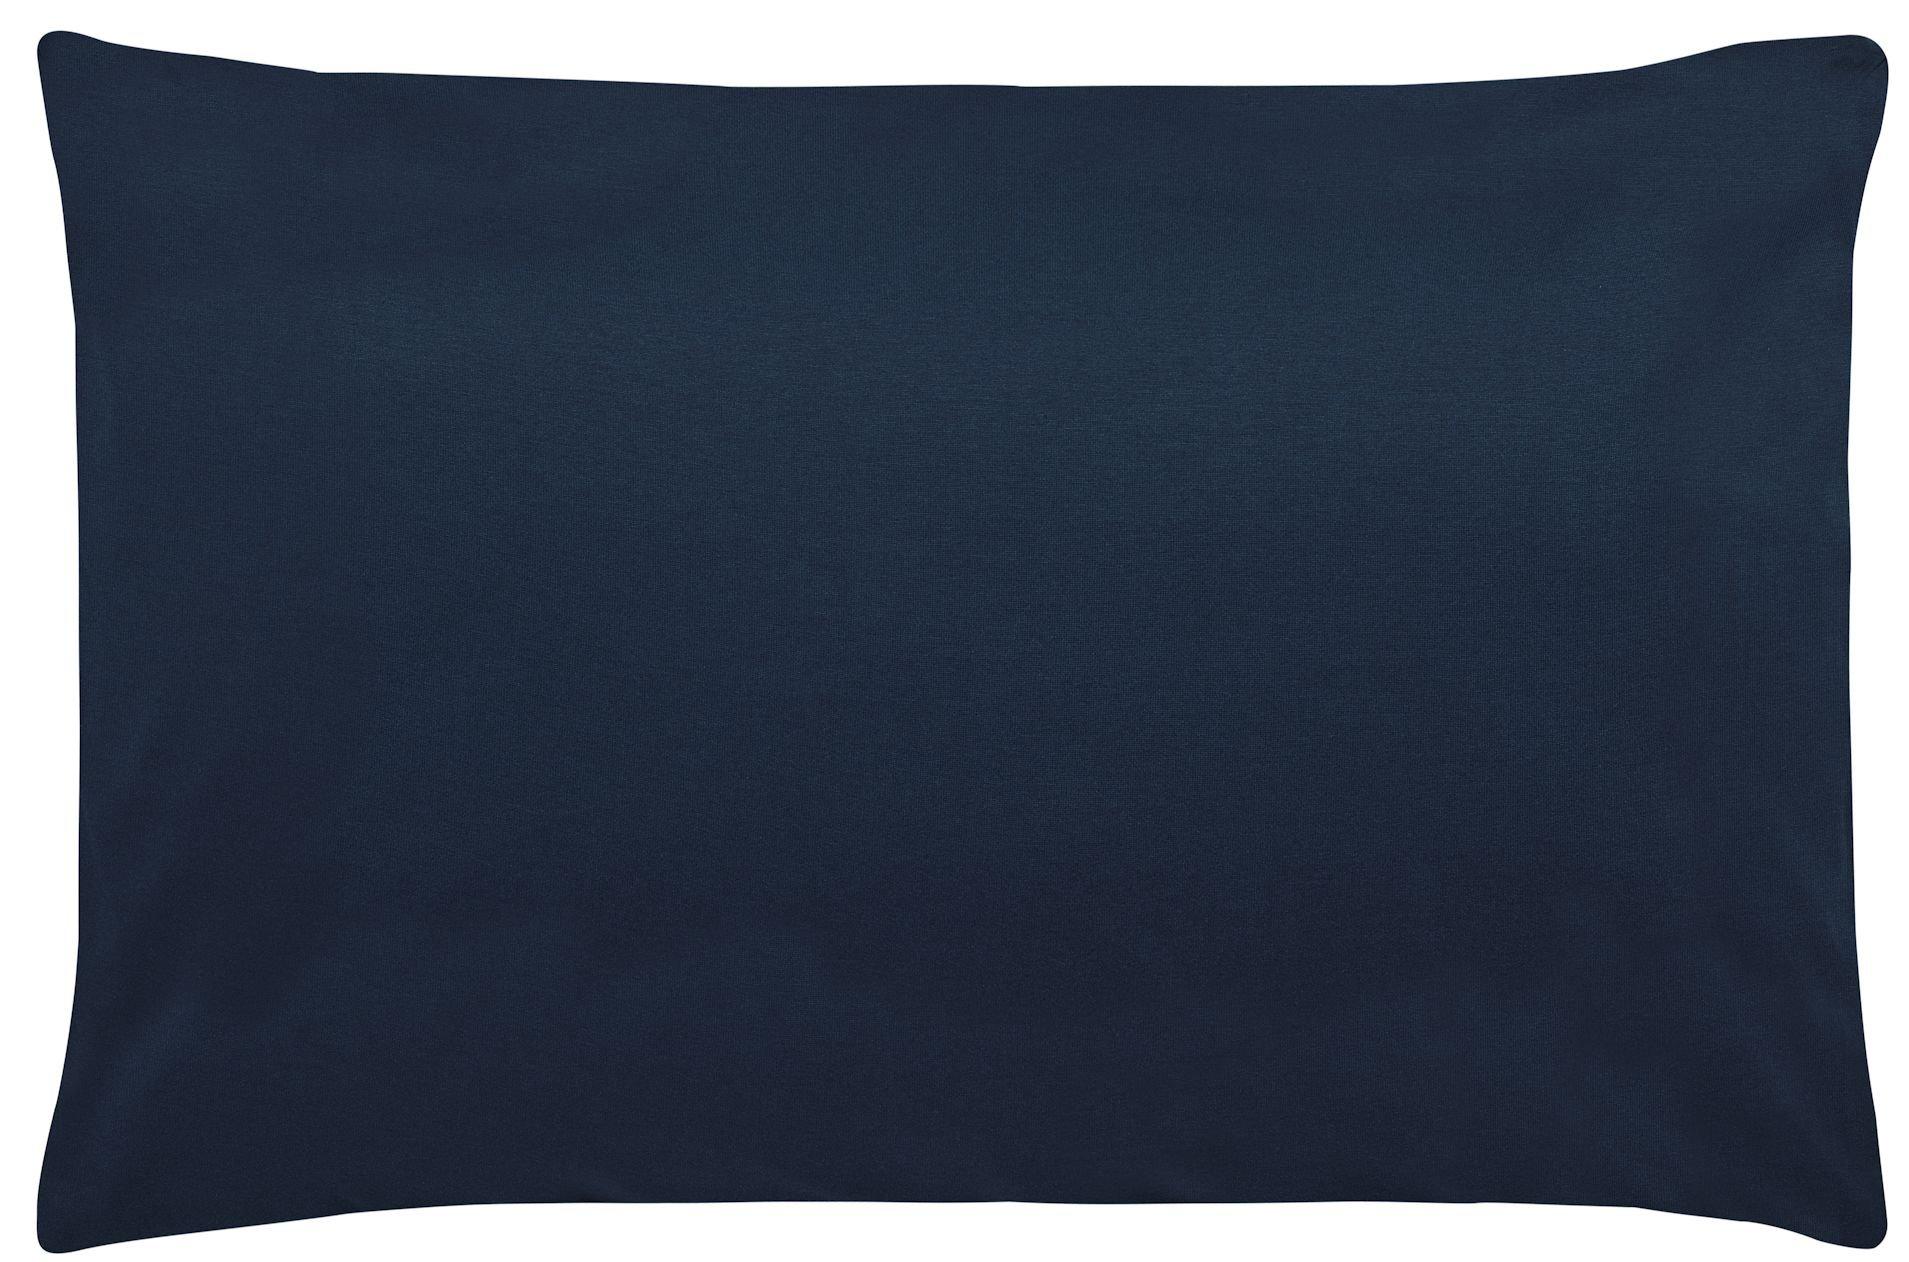 Edel-Zwirn-Jersey marine B40cm